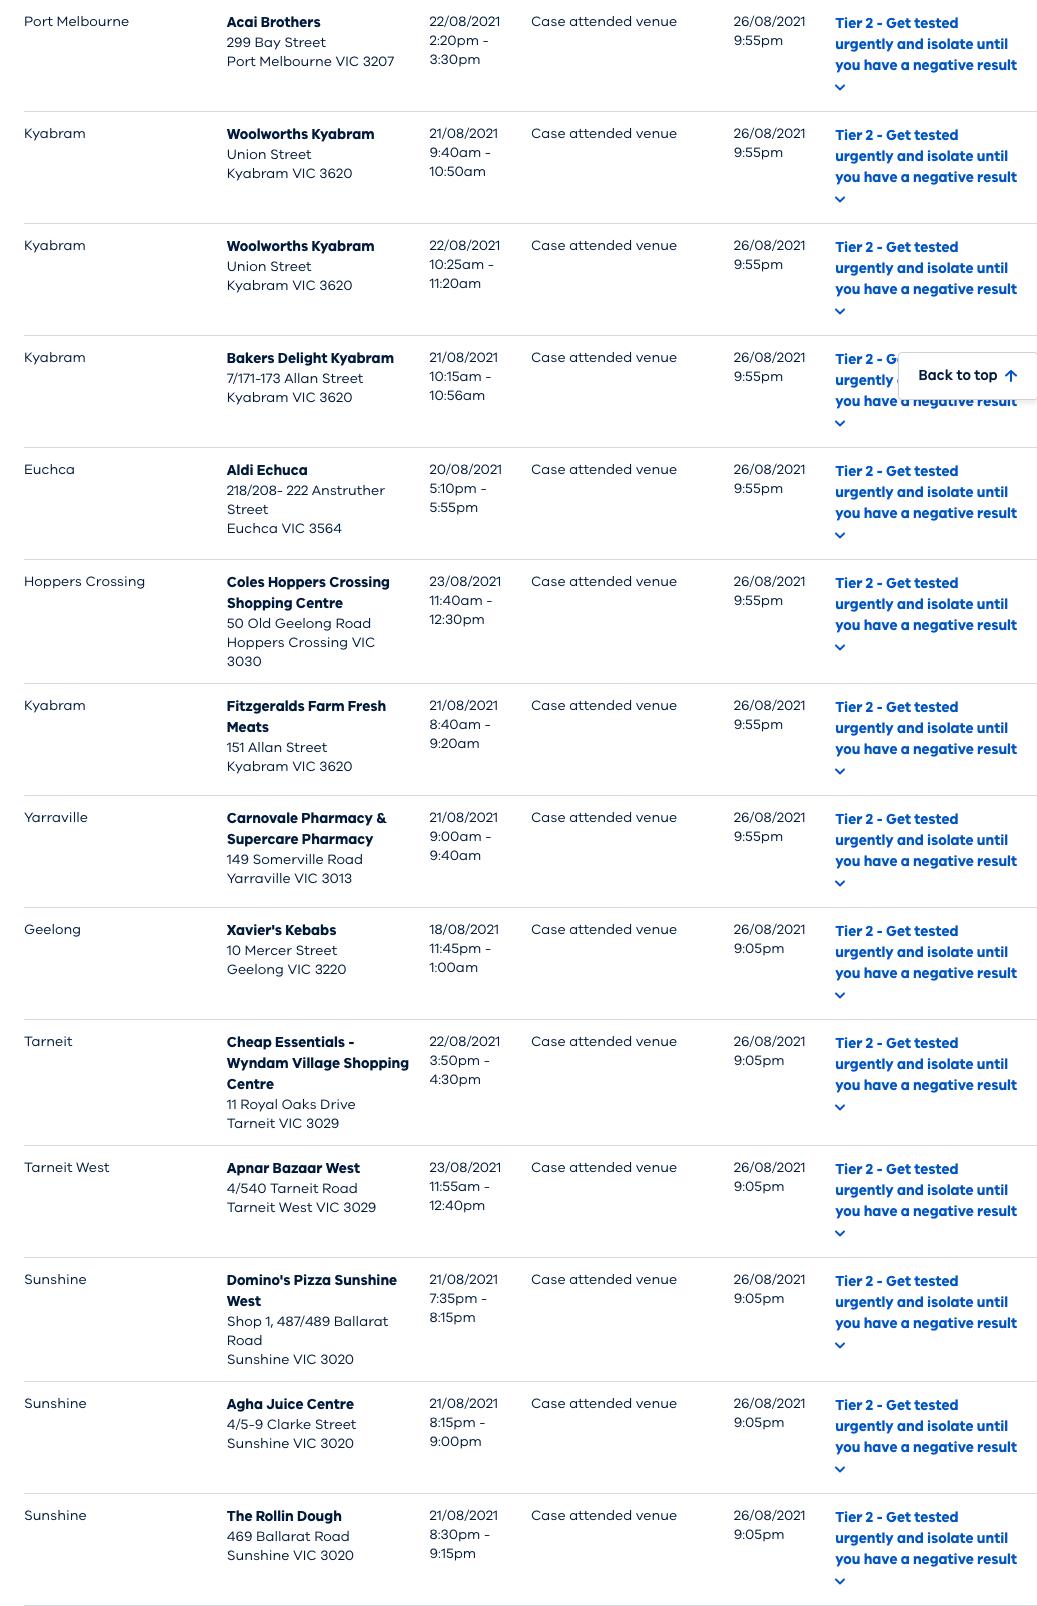 www.coronavirus.vic.gov.au_exposure-sites (14)的副本.png